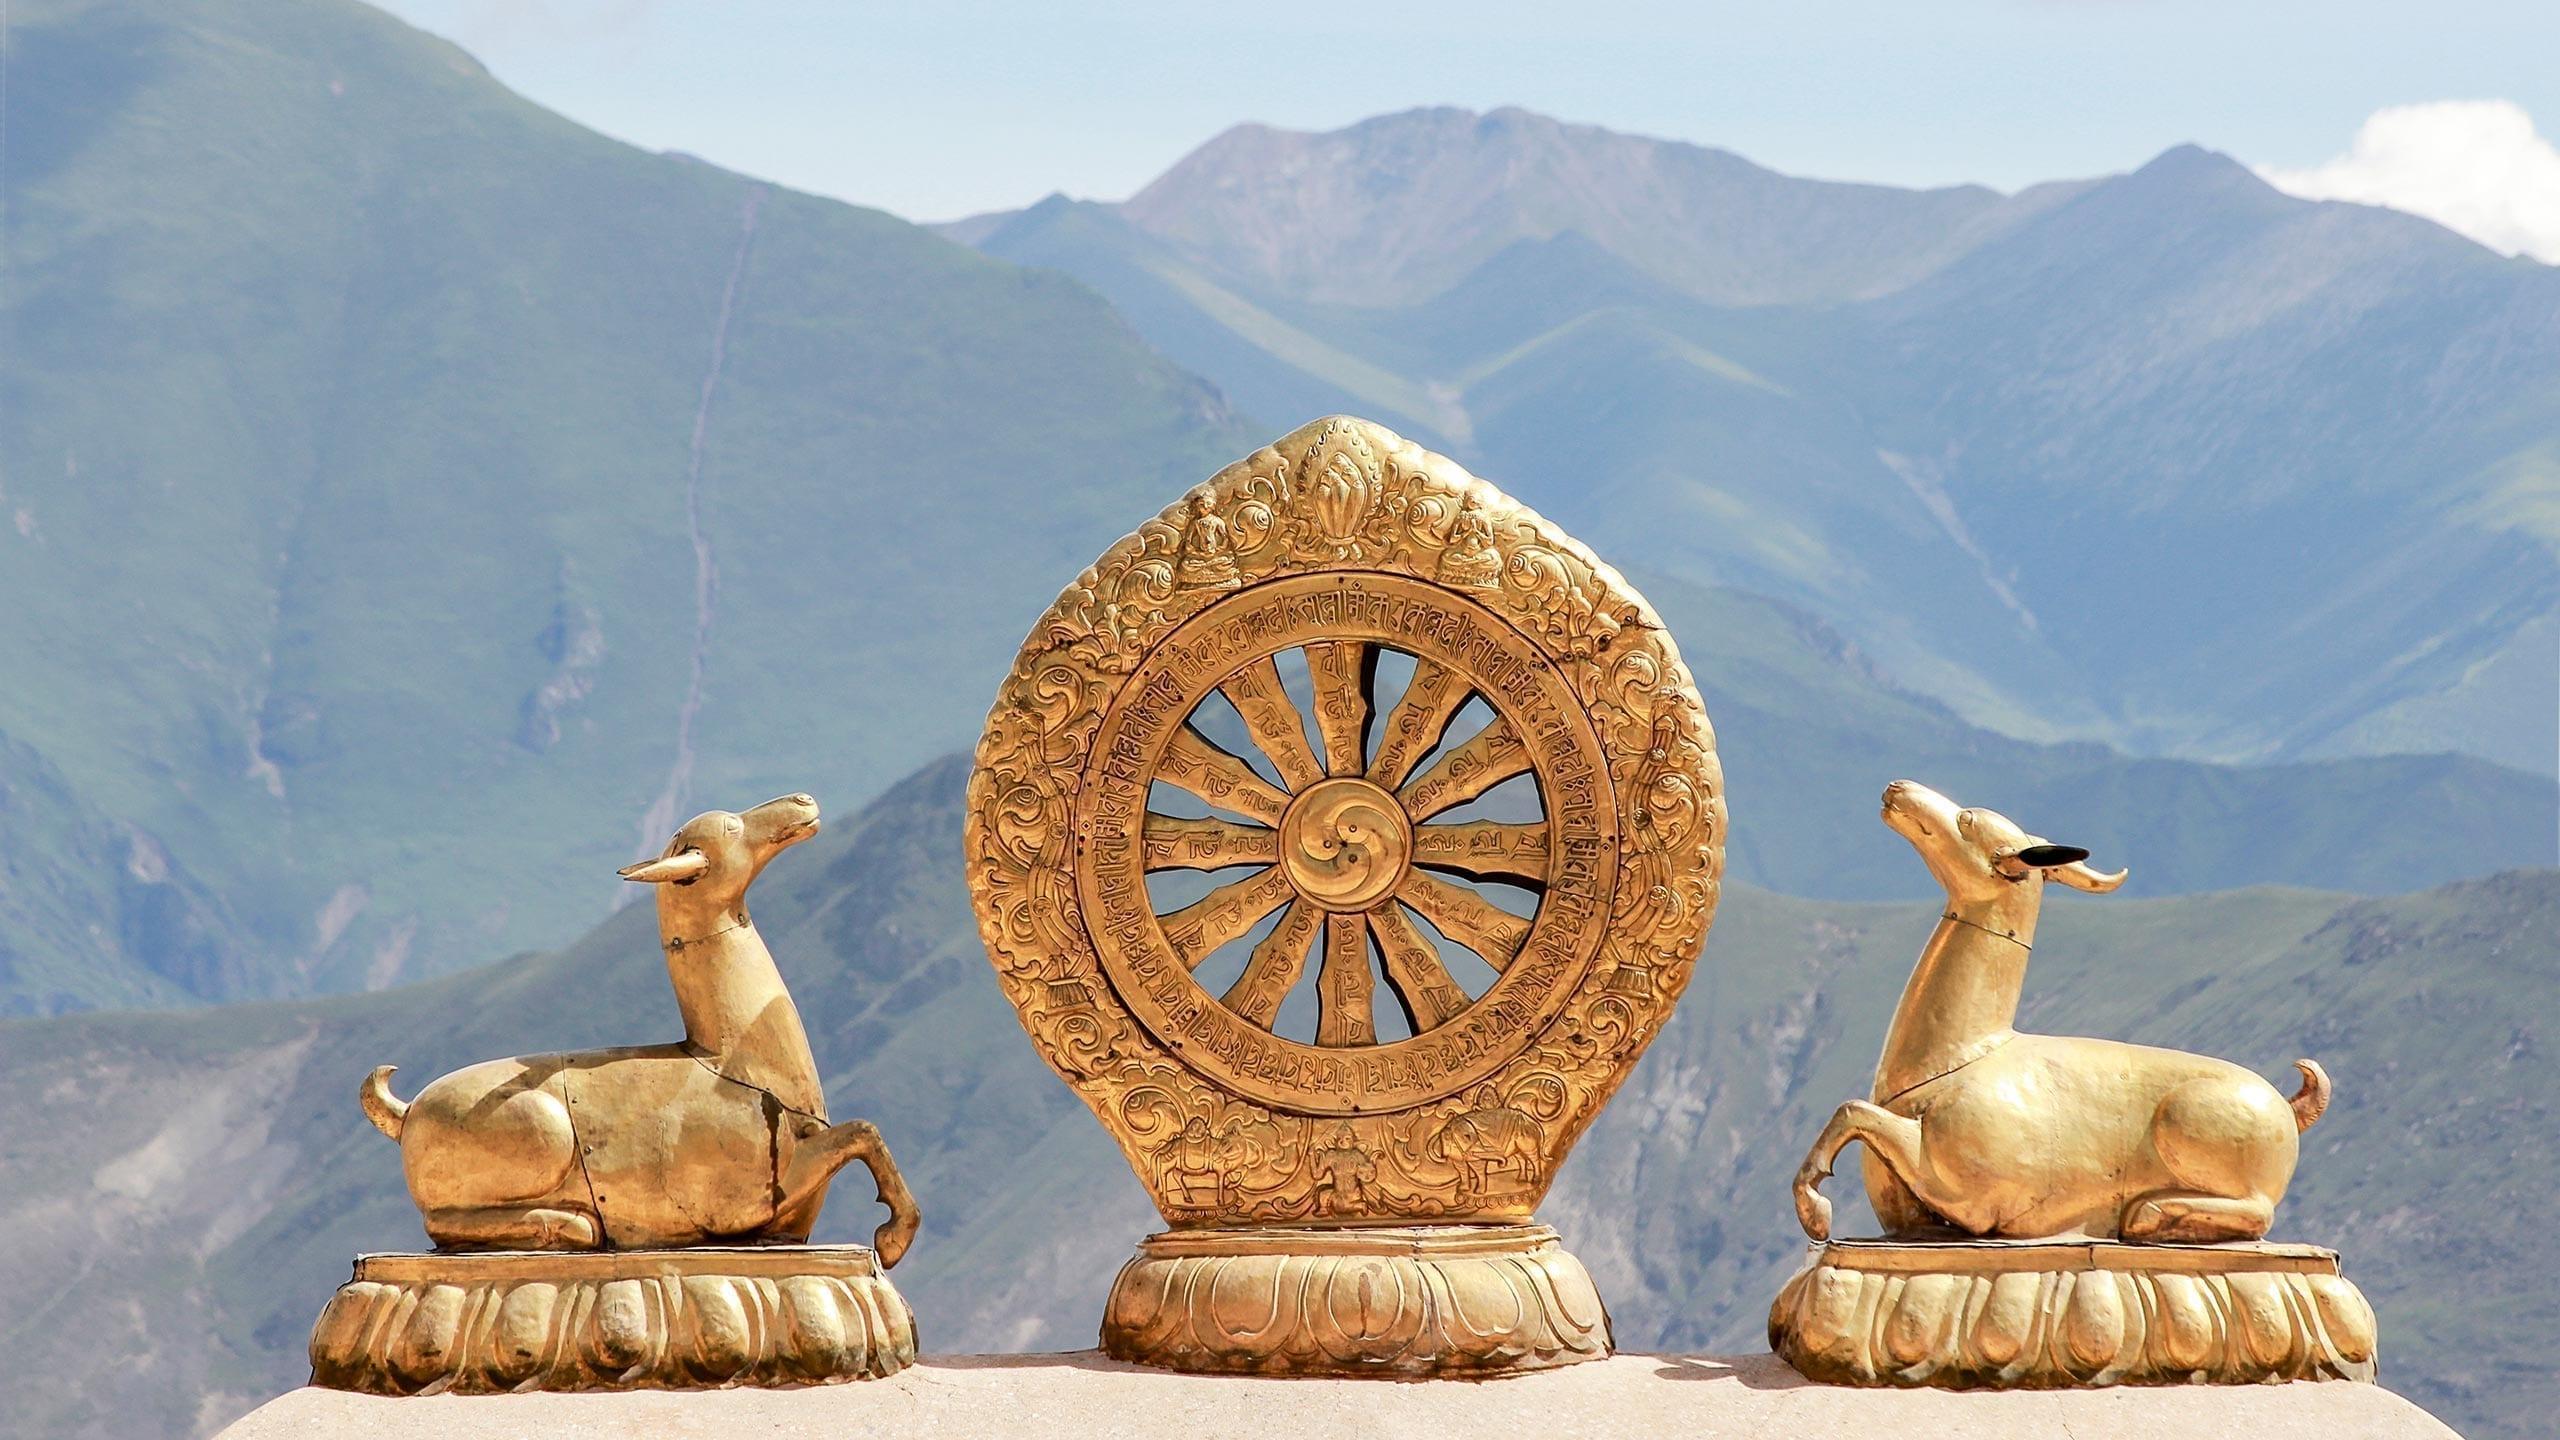 Dharma Wheel at the roof of Jokhang, Lhasa, Tibet